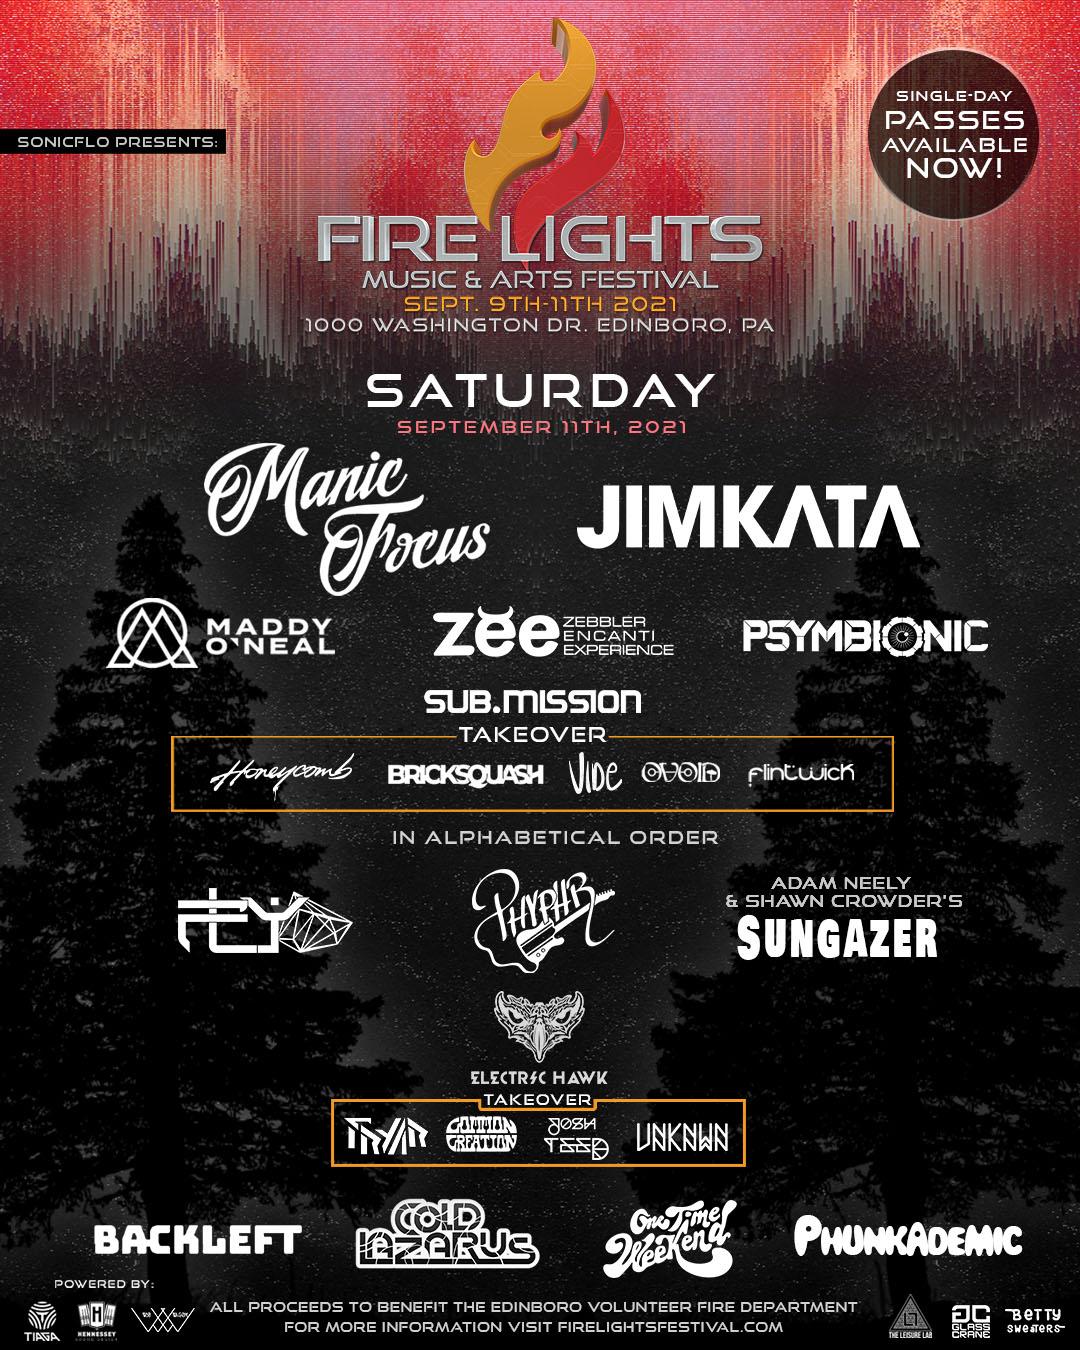 Firelights Saturday